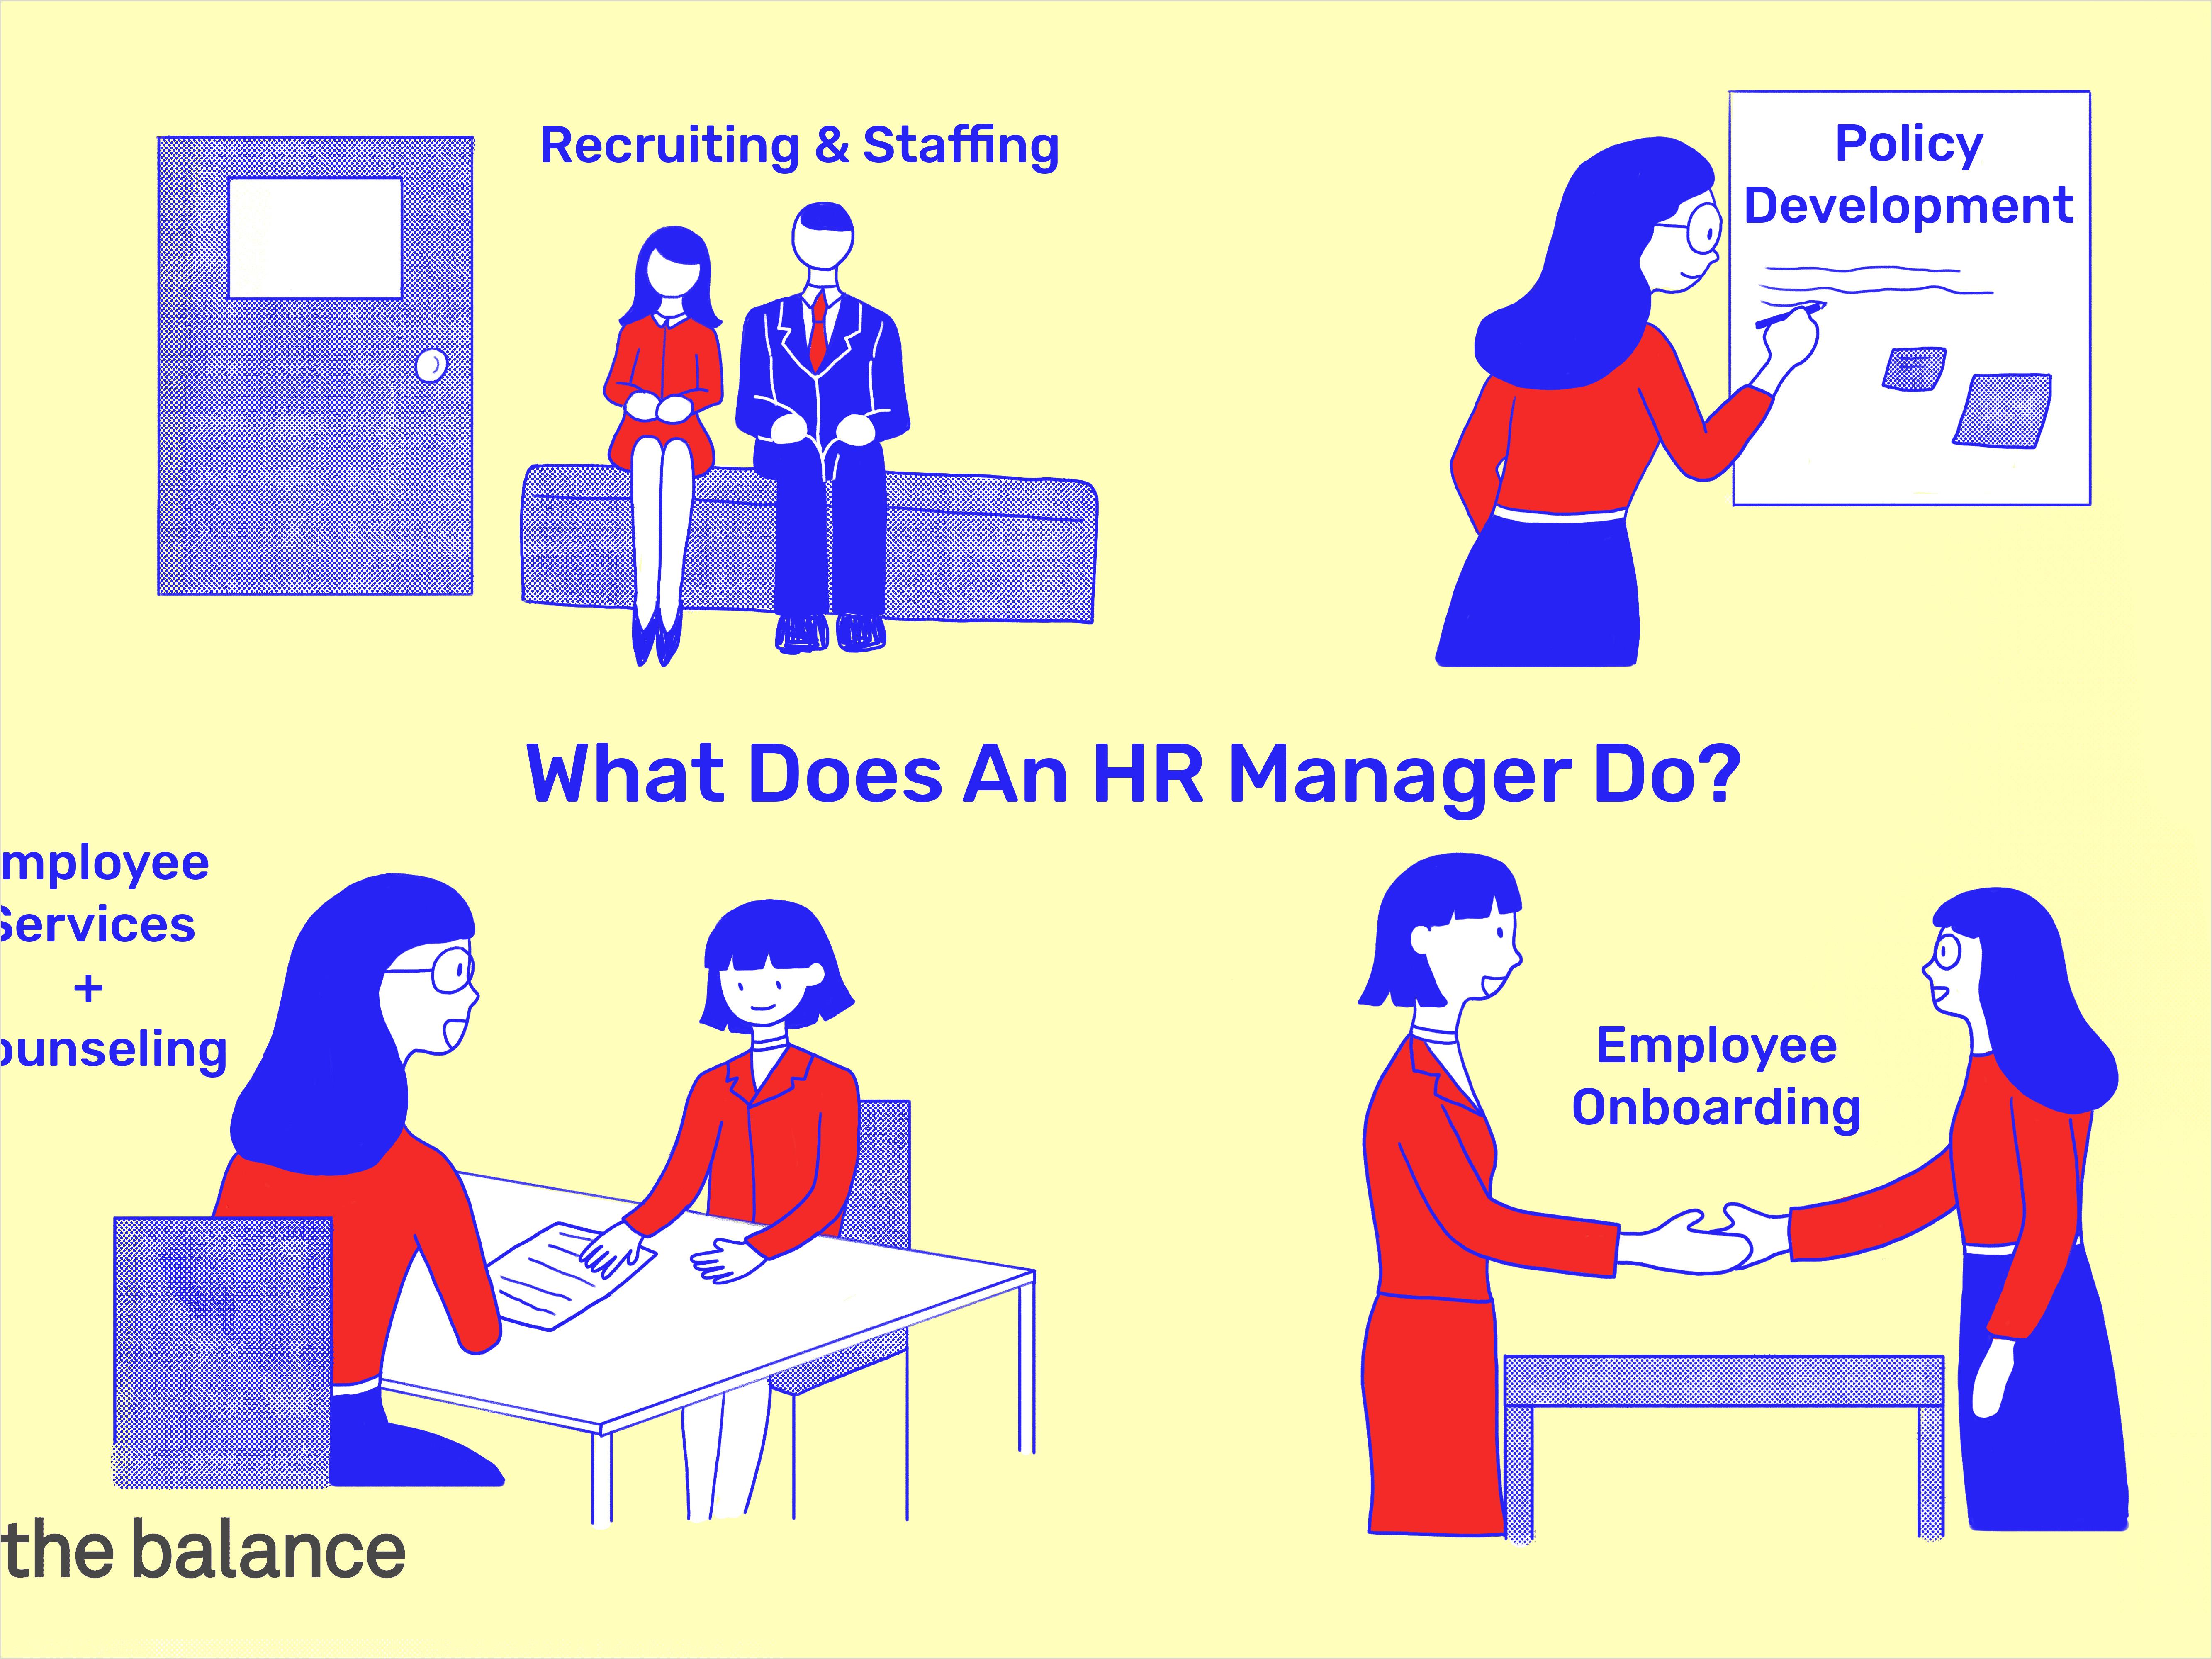 Hotel Director Of Sales Job Description See A Sample Human Resources Manager Job Description